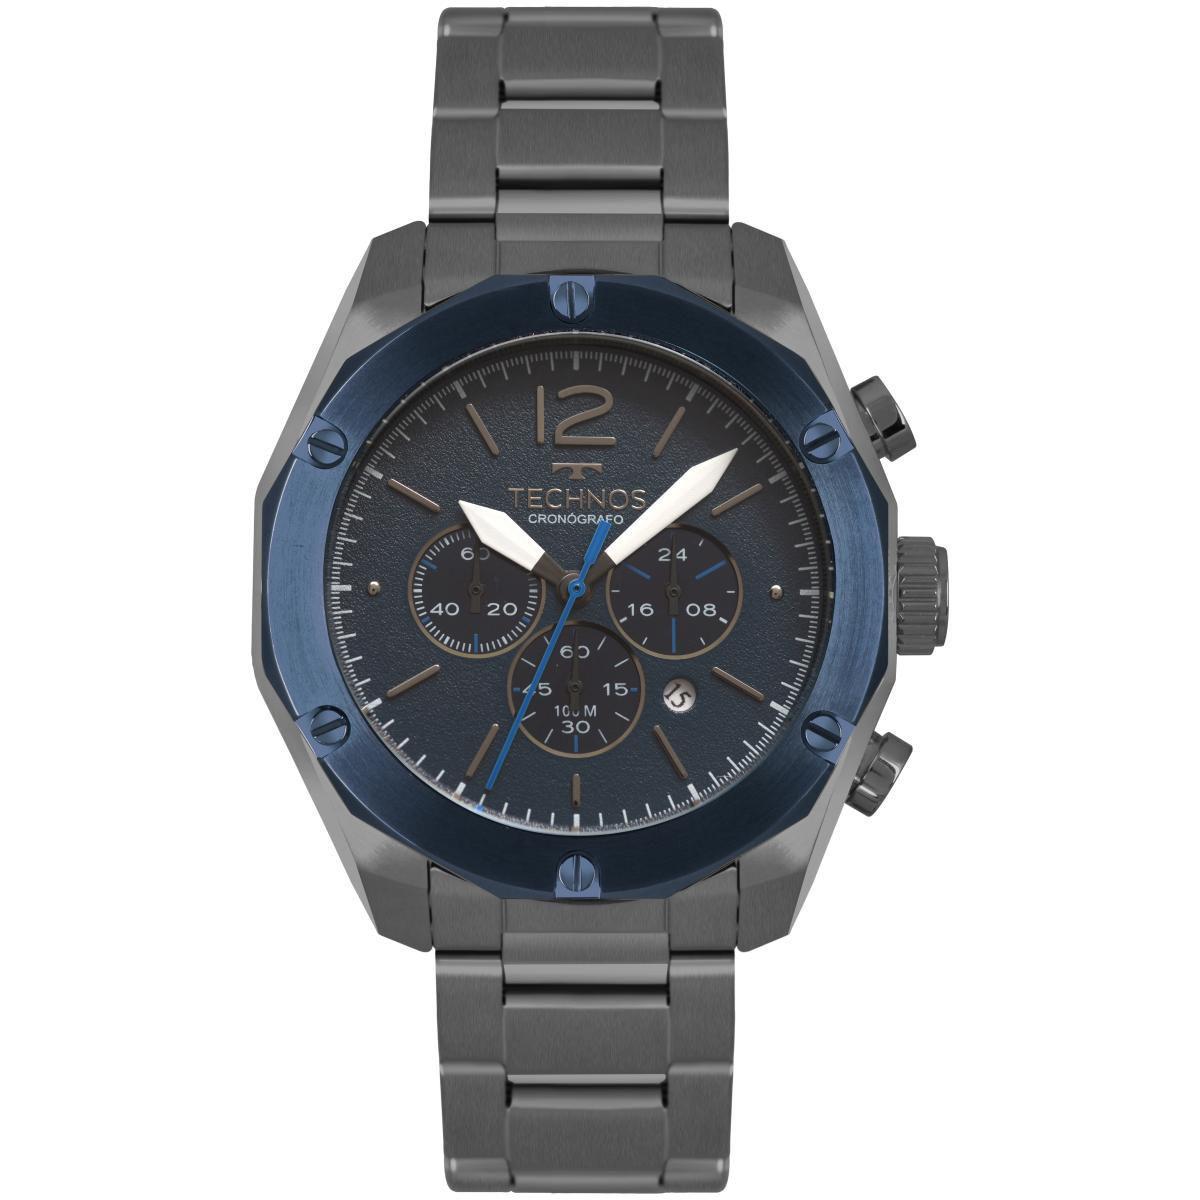 Relógio Masculino Technos OS20HMG/4A 45mm Aço Grafite